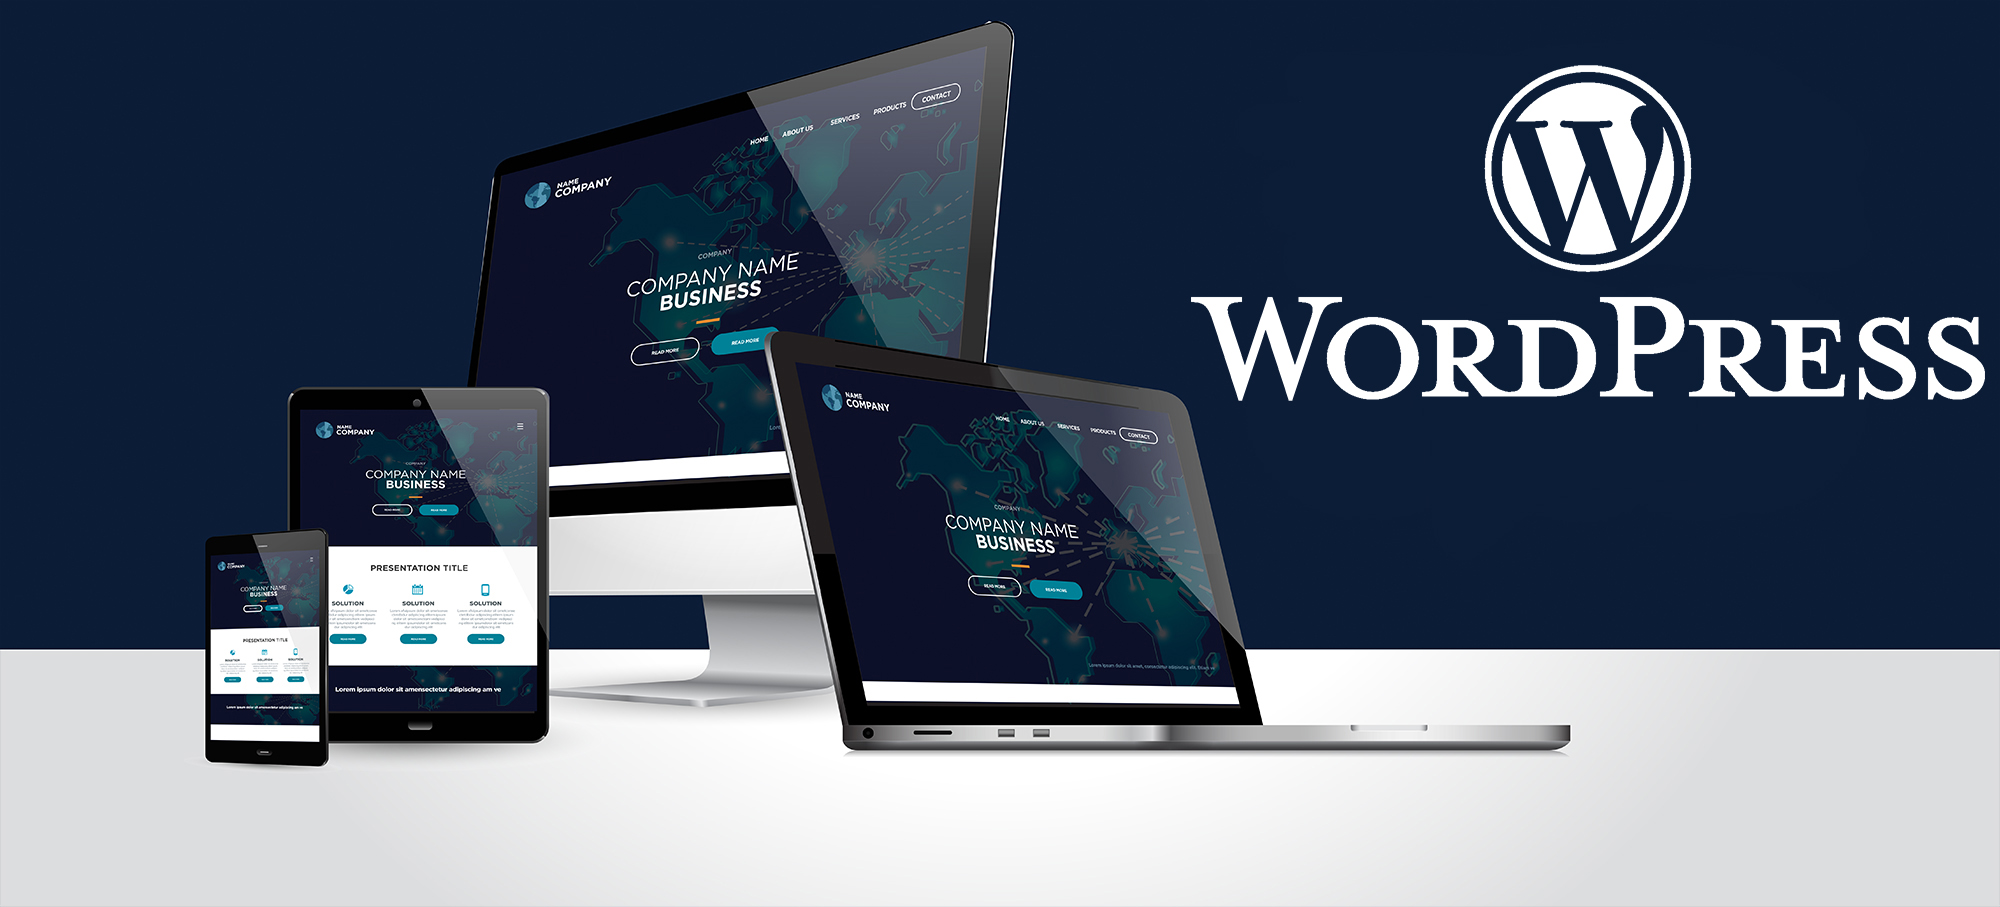 Dinobi-Webdesign